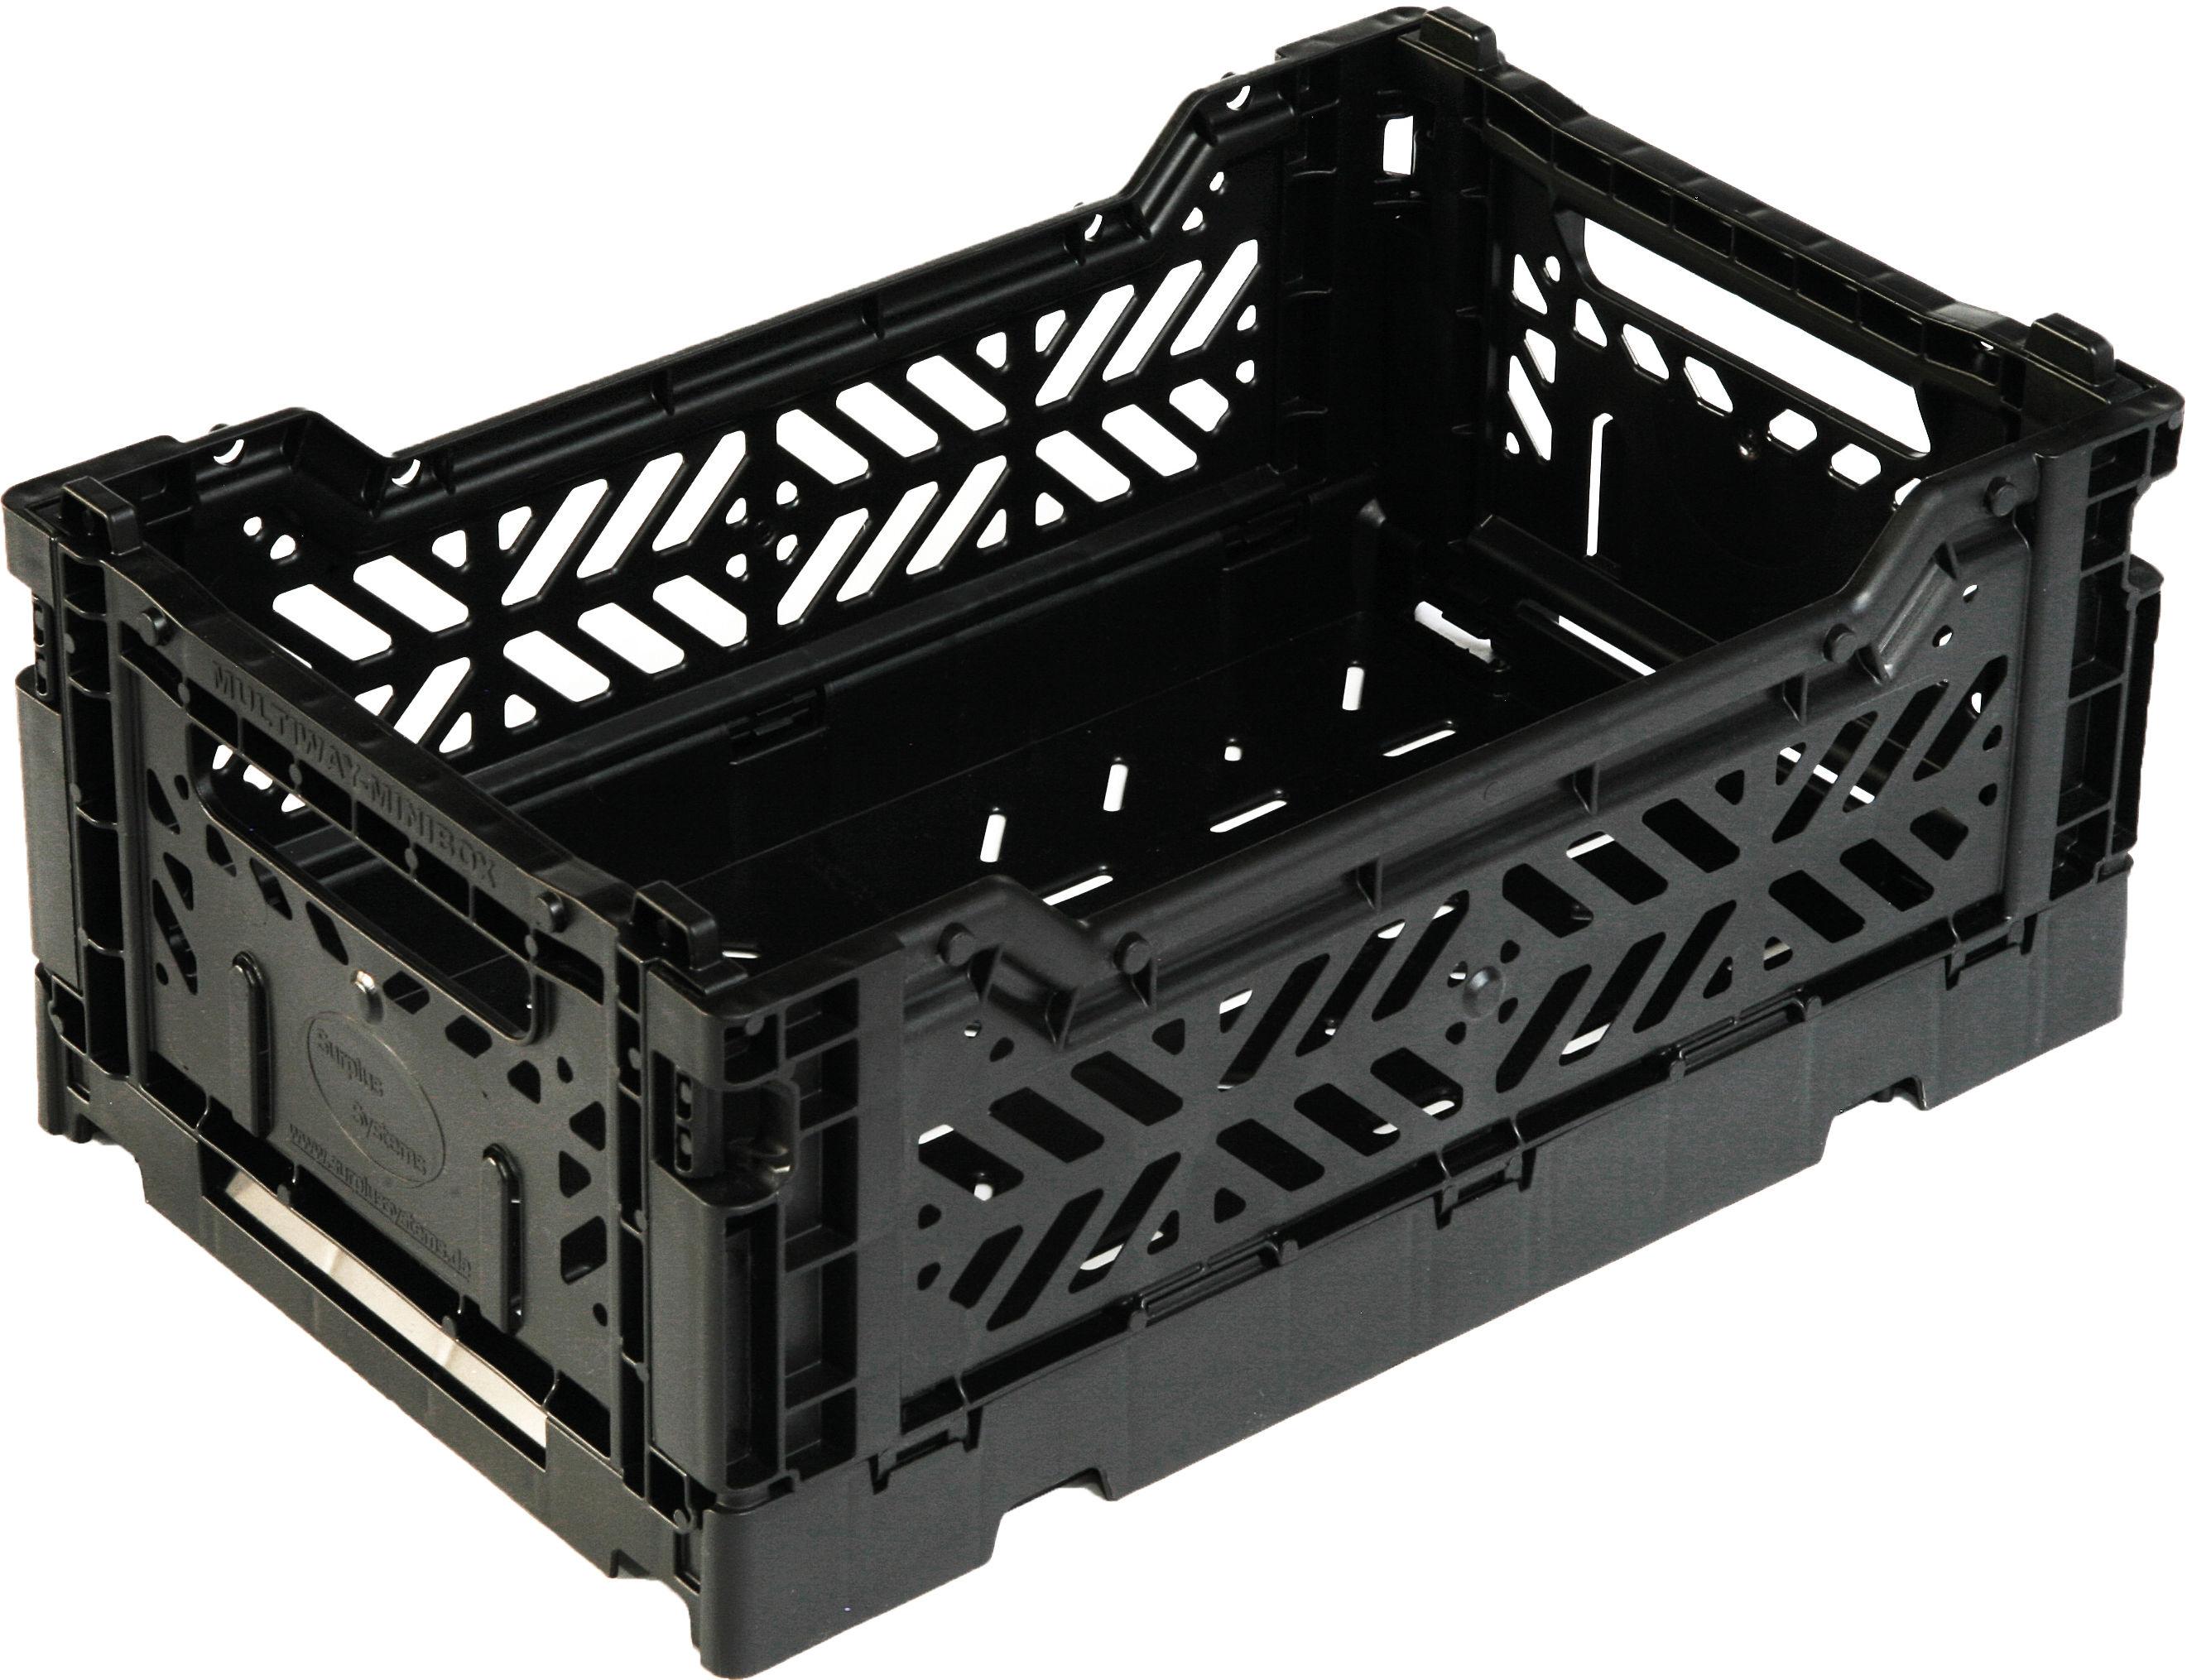 Accessories - Desk & Office Accessories - Mini Box Storage rack - Foldable L 26,5 cm by Surplus Systems - Pop Corn - Black - Polypropylene